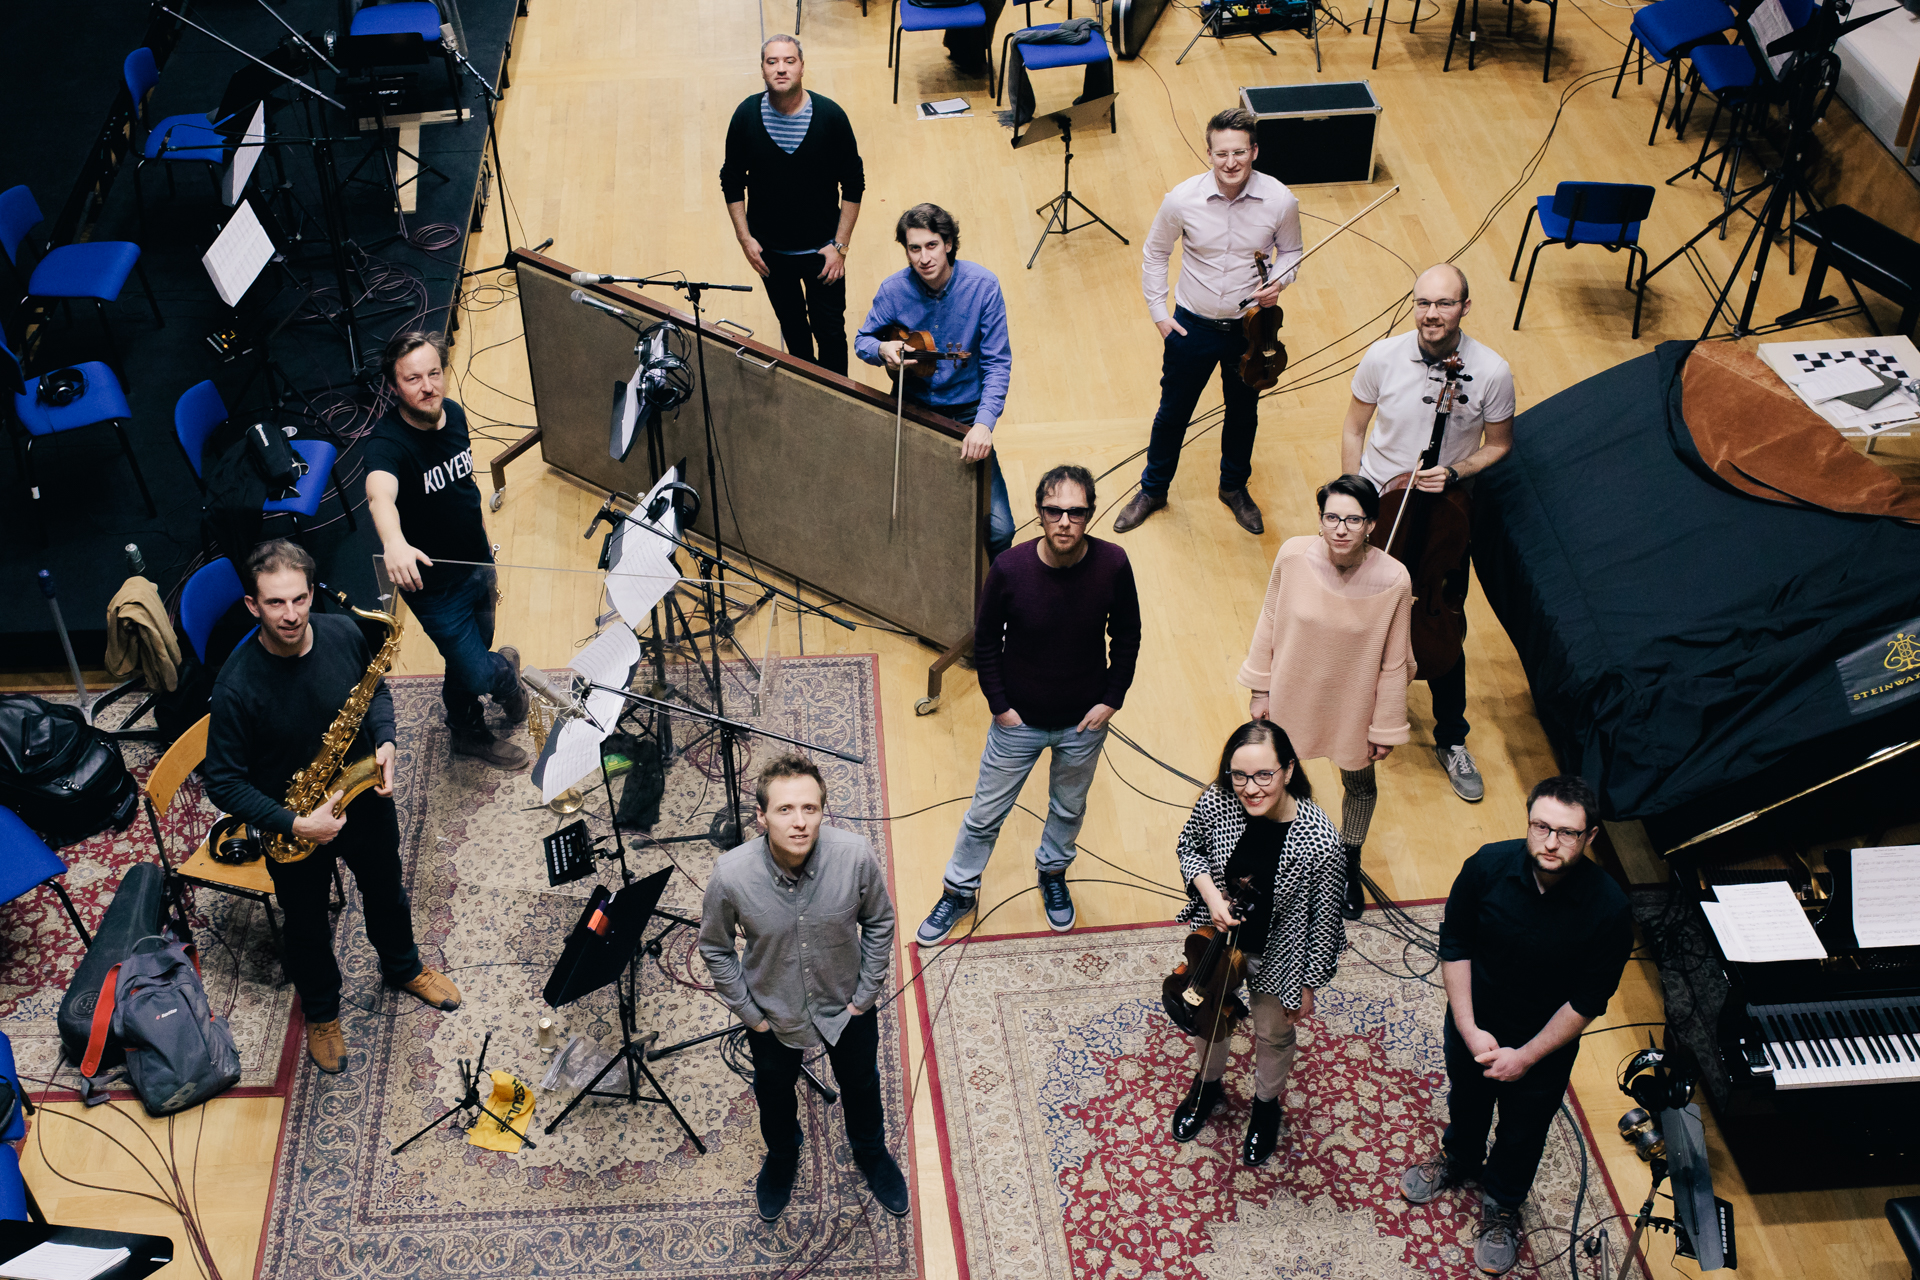 Recording The Port of Life II. - Enso @ RTV Slovenija